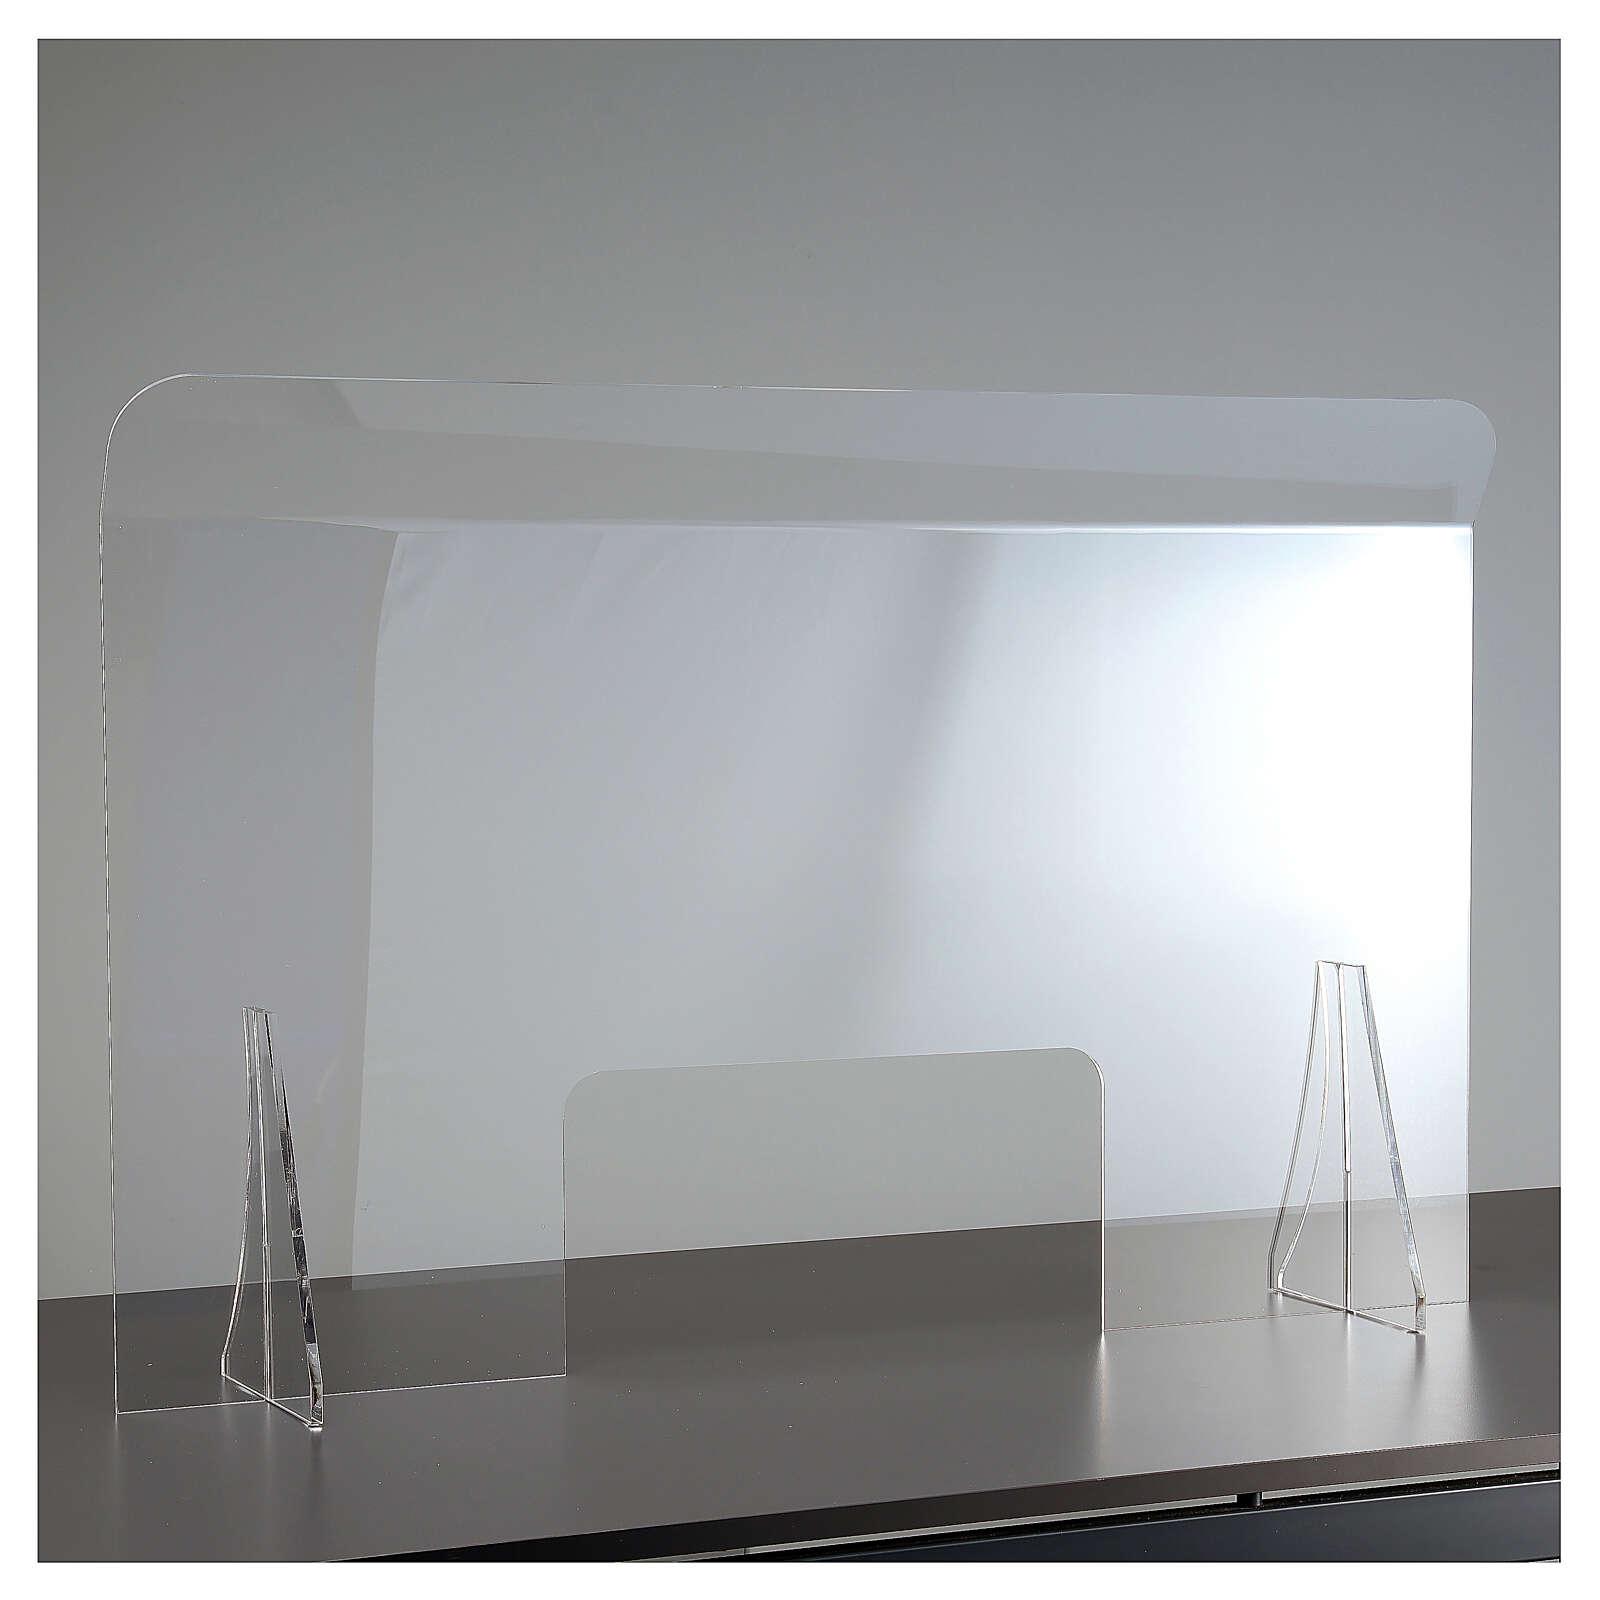 Protective plexiglass divider 80x100 cm window 30x50 cm 3